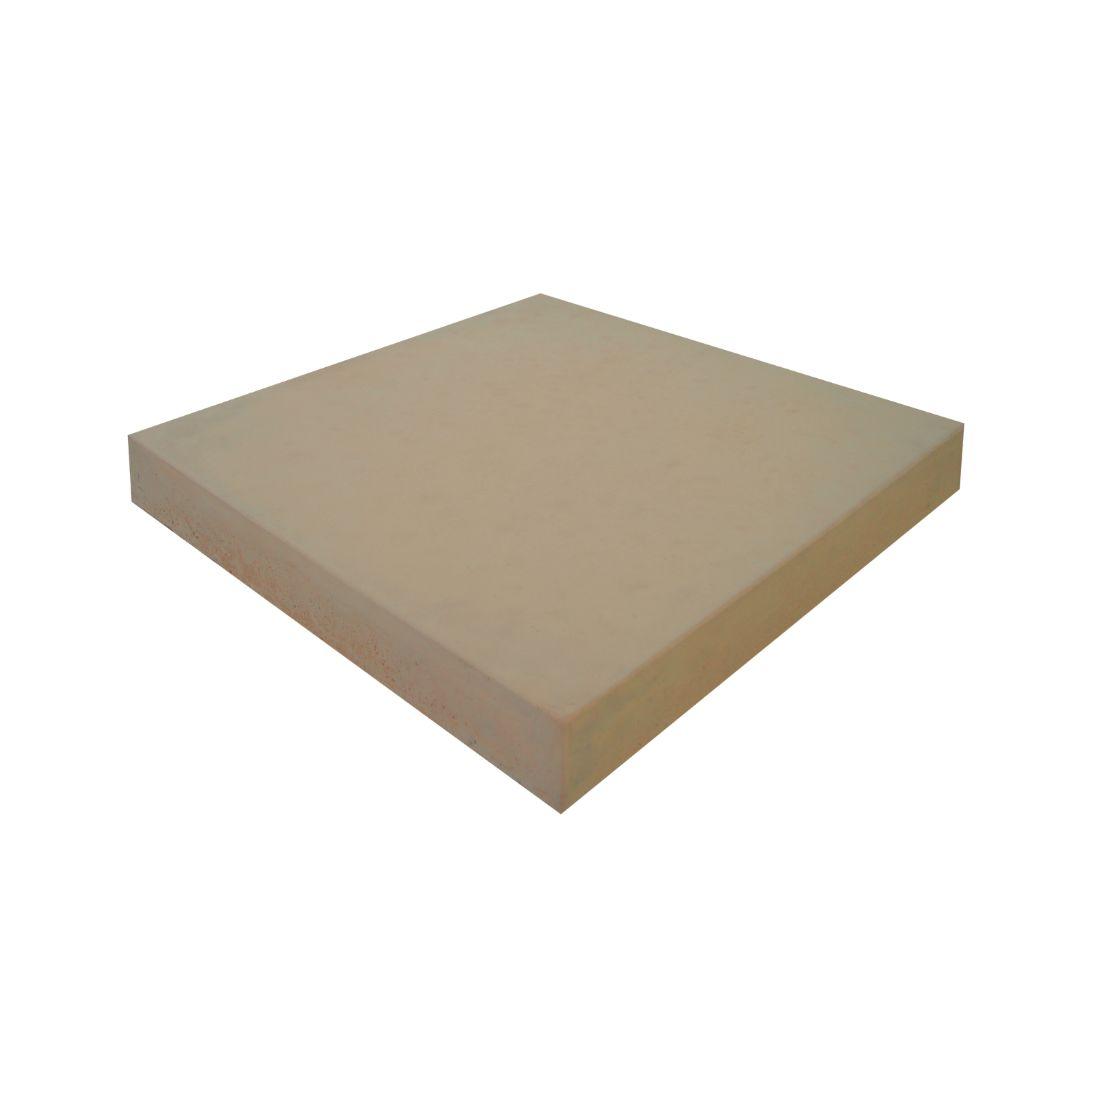 Milano Concrete Paver 300 x 300 x 37mm Cream Sands